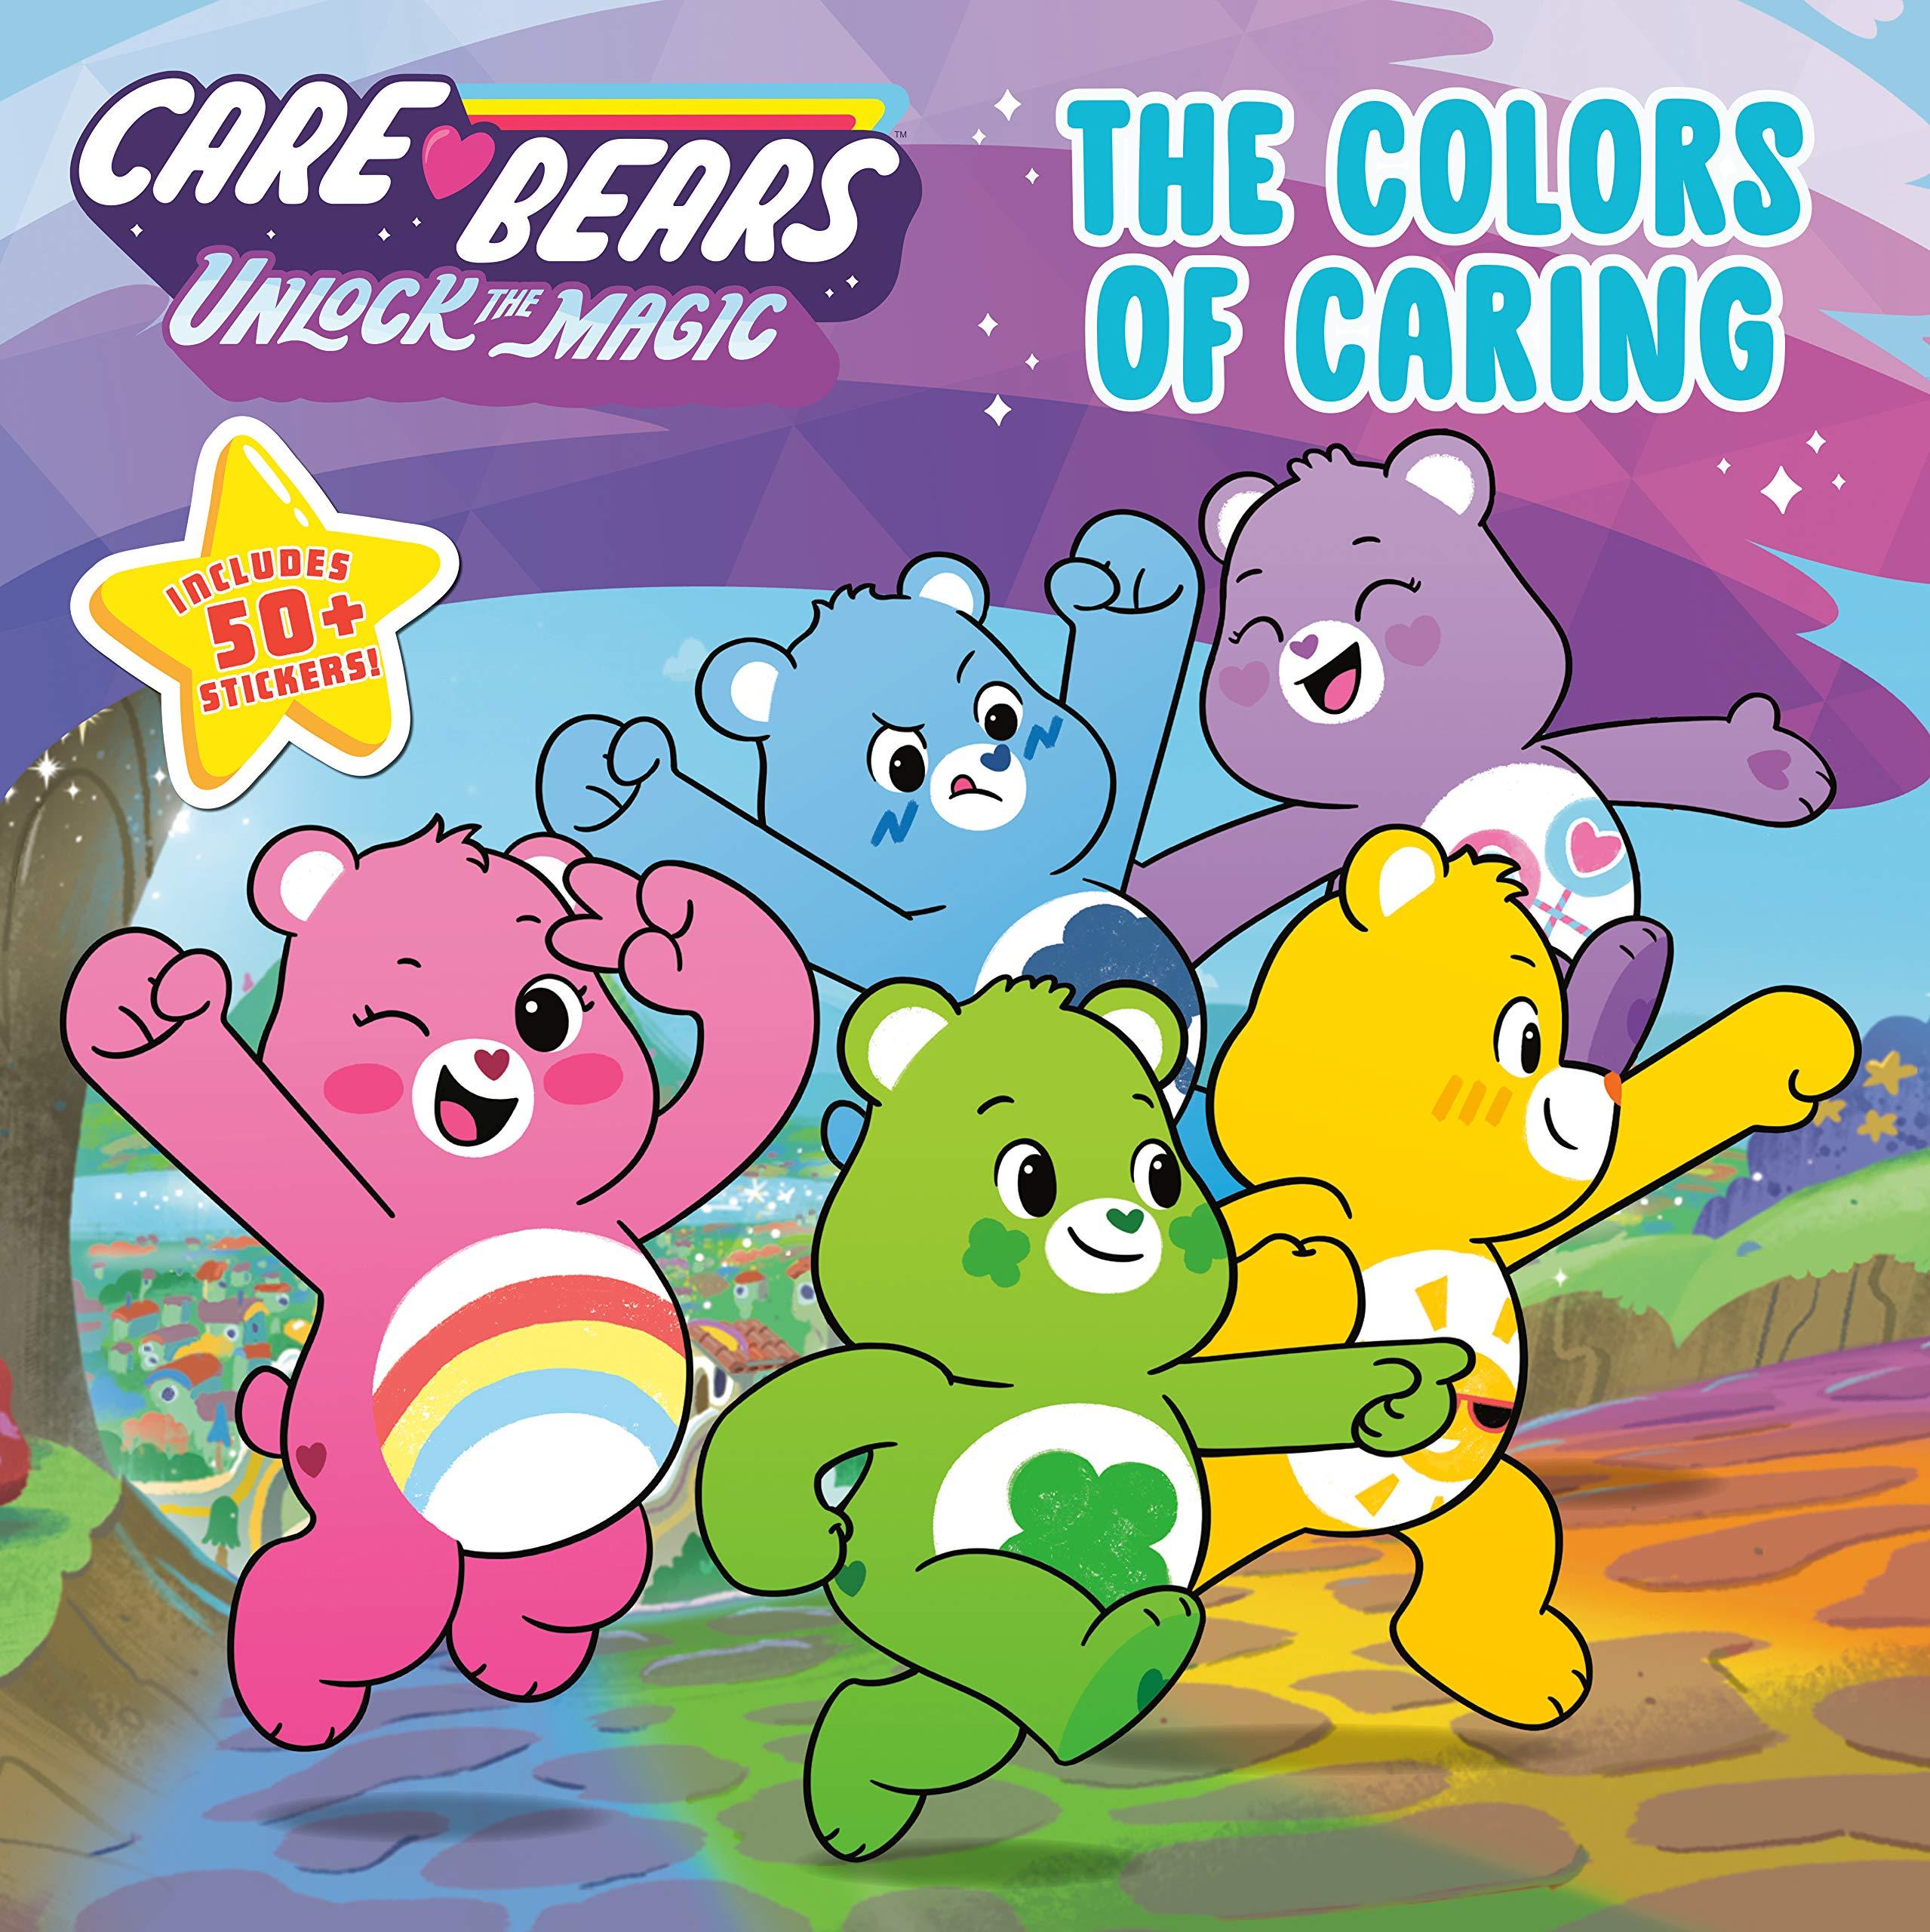 The Colors of Caring (Care Bears: Unlock the Magic): Saxon, Victoria: 9780593097069: Amazon.com: Books